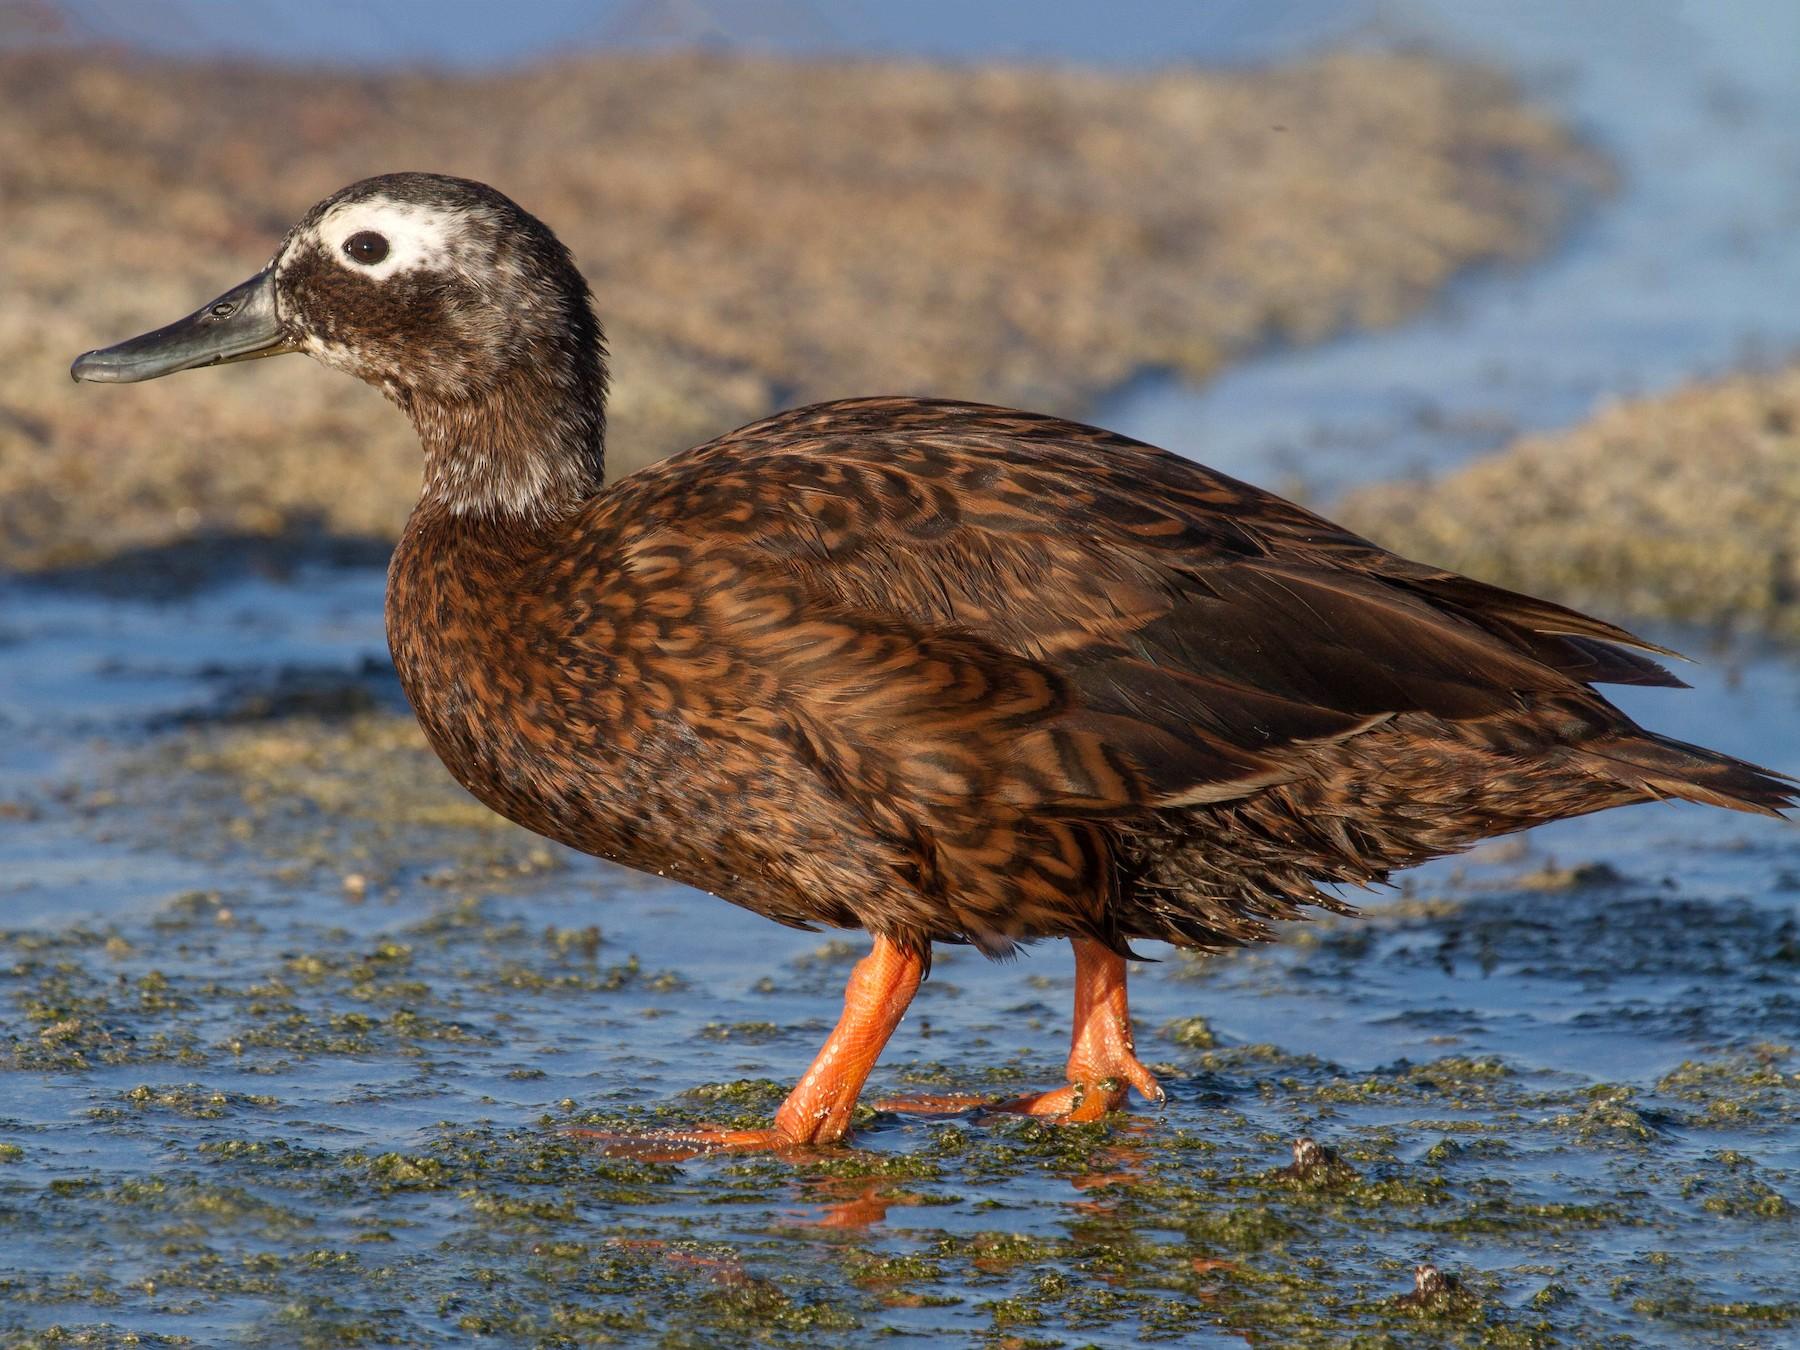 Laysan Duck - Robby Kohley